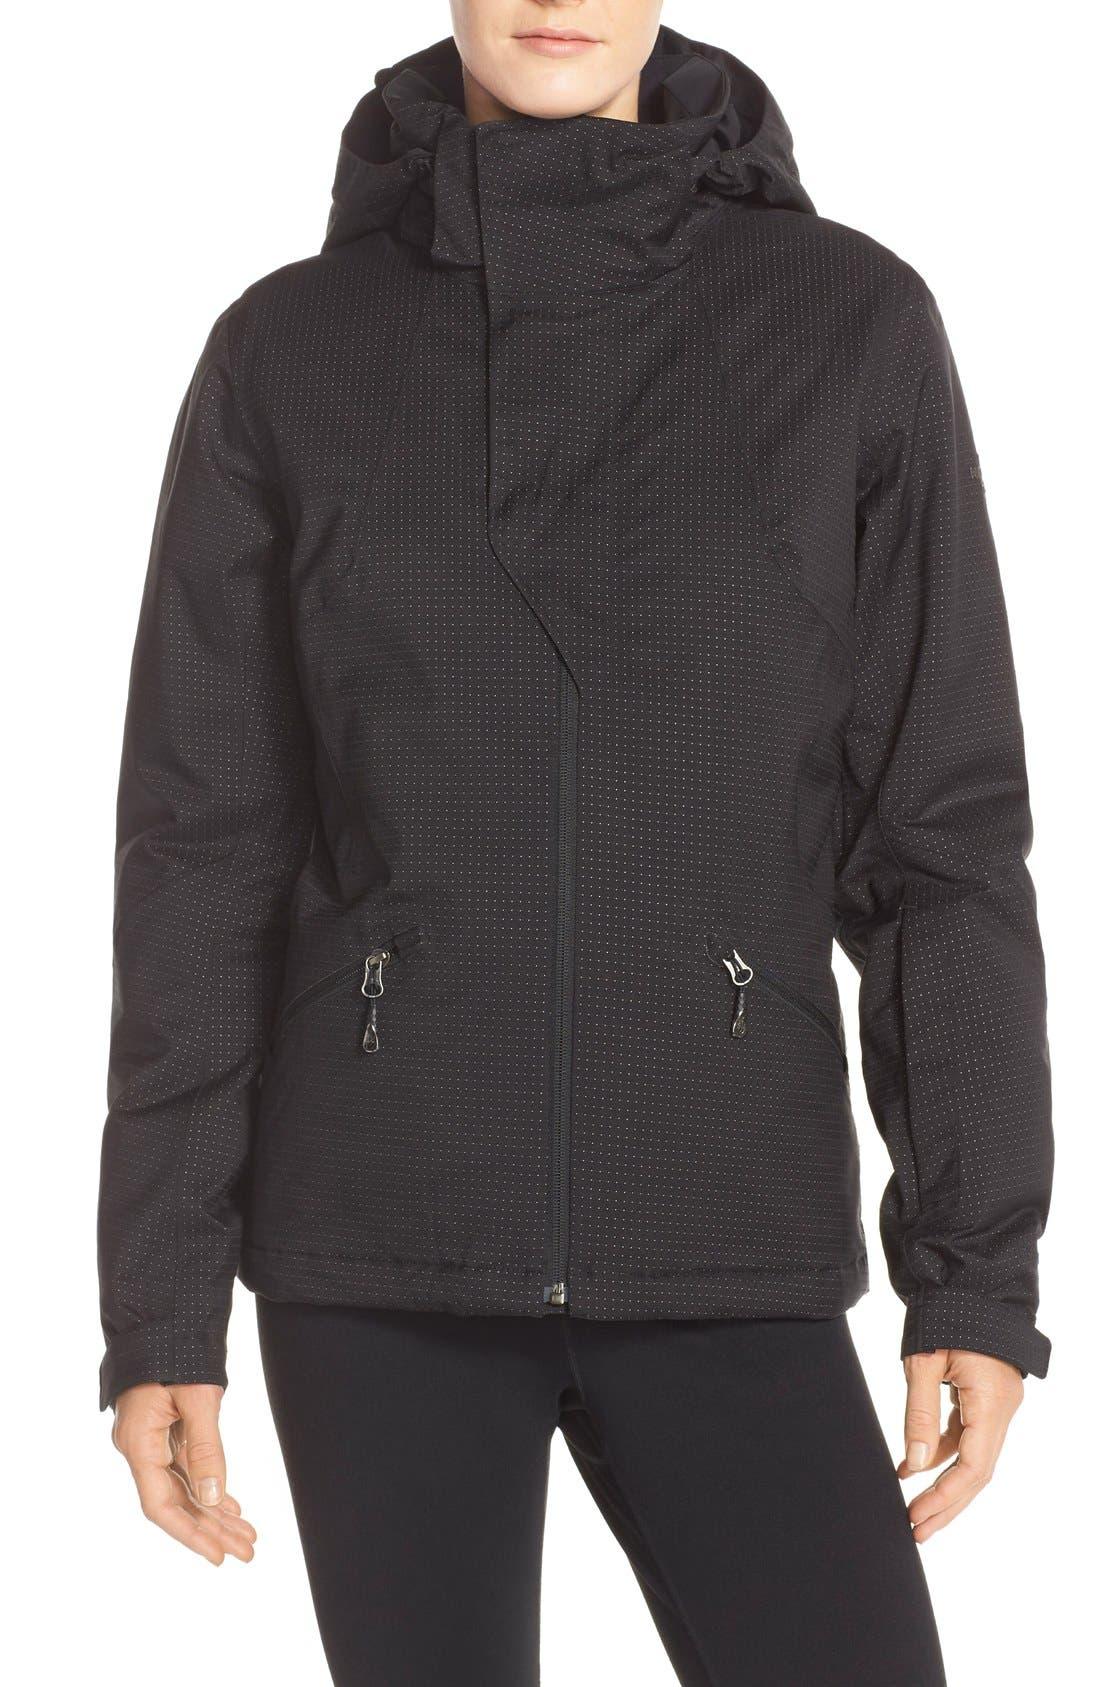 THE NORTH FACE 'Lulea' Waterpoof Heatseeker<sup>™</sup> Jacket, Main, color, 001